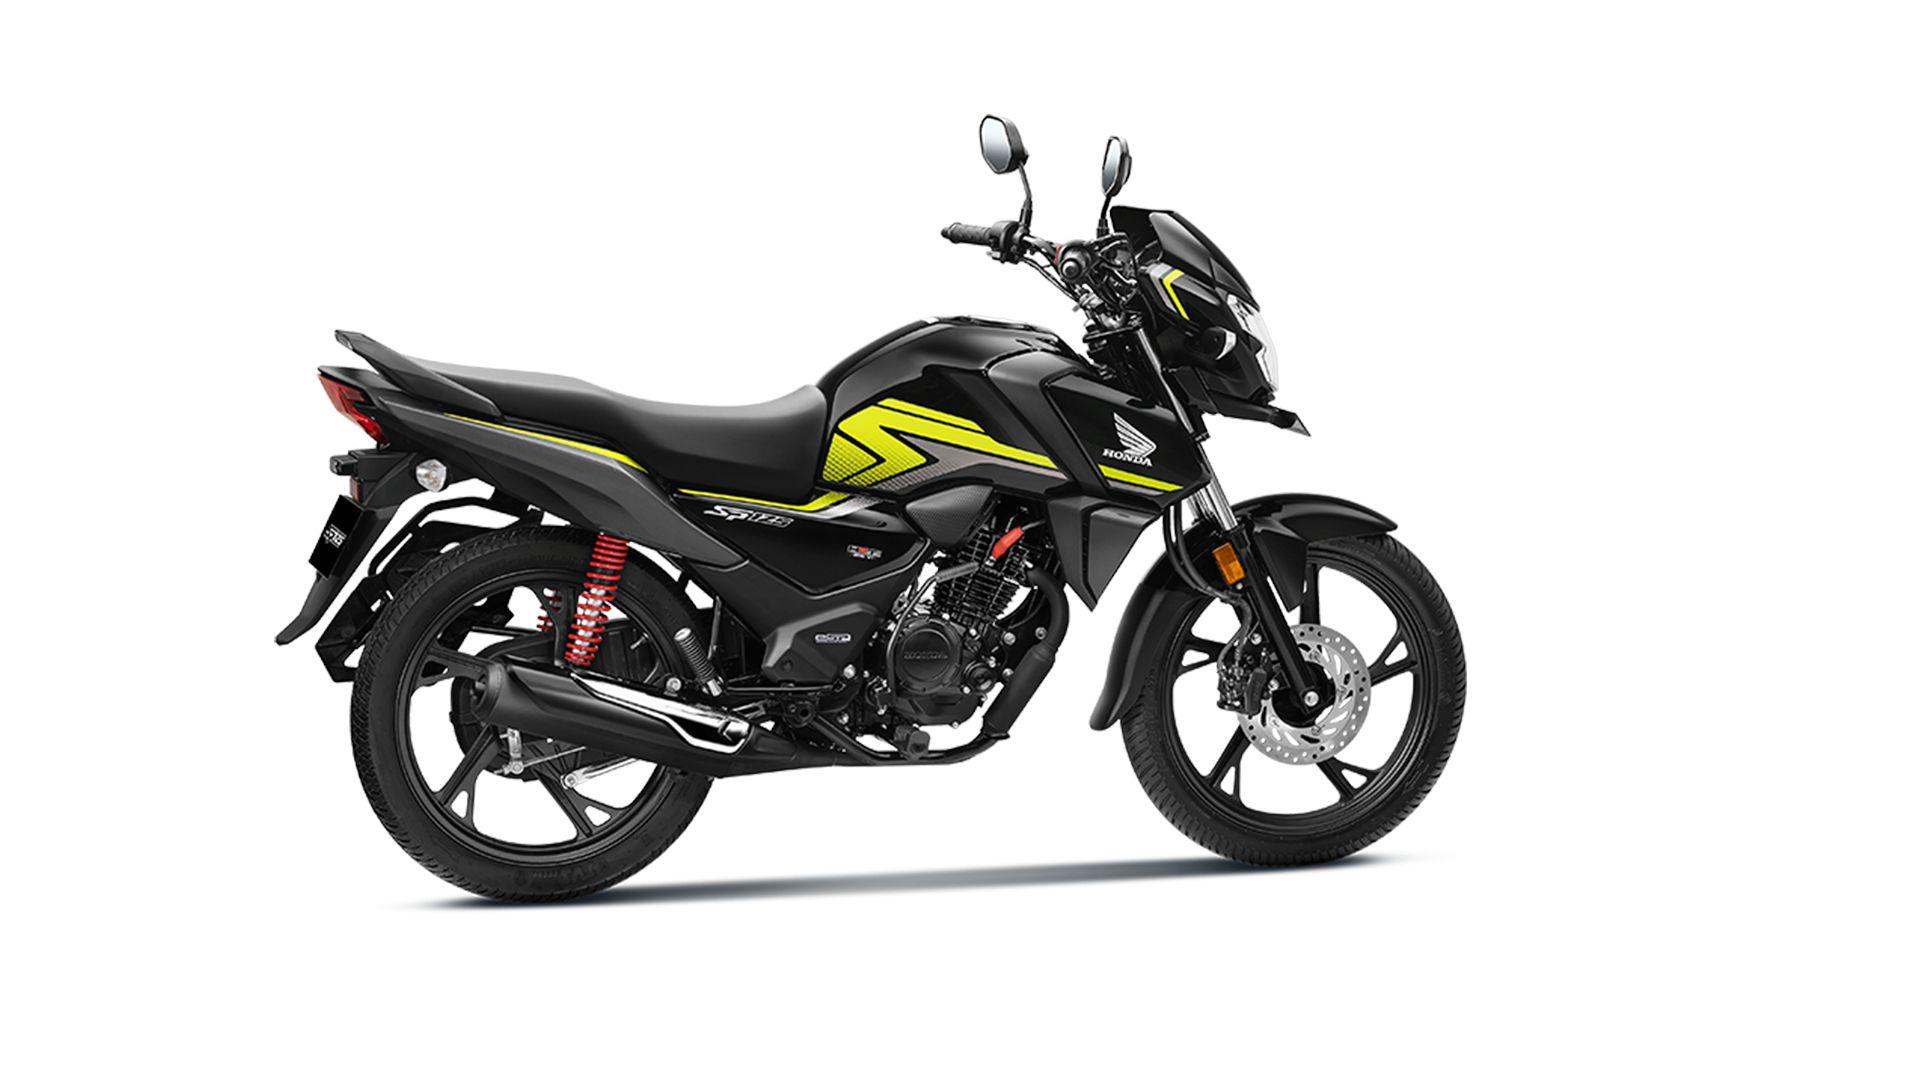 Honda Upcoming Bikes 2020 Release Date Check More At Http Car